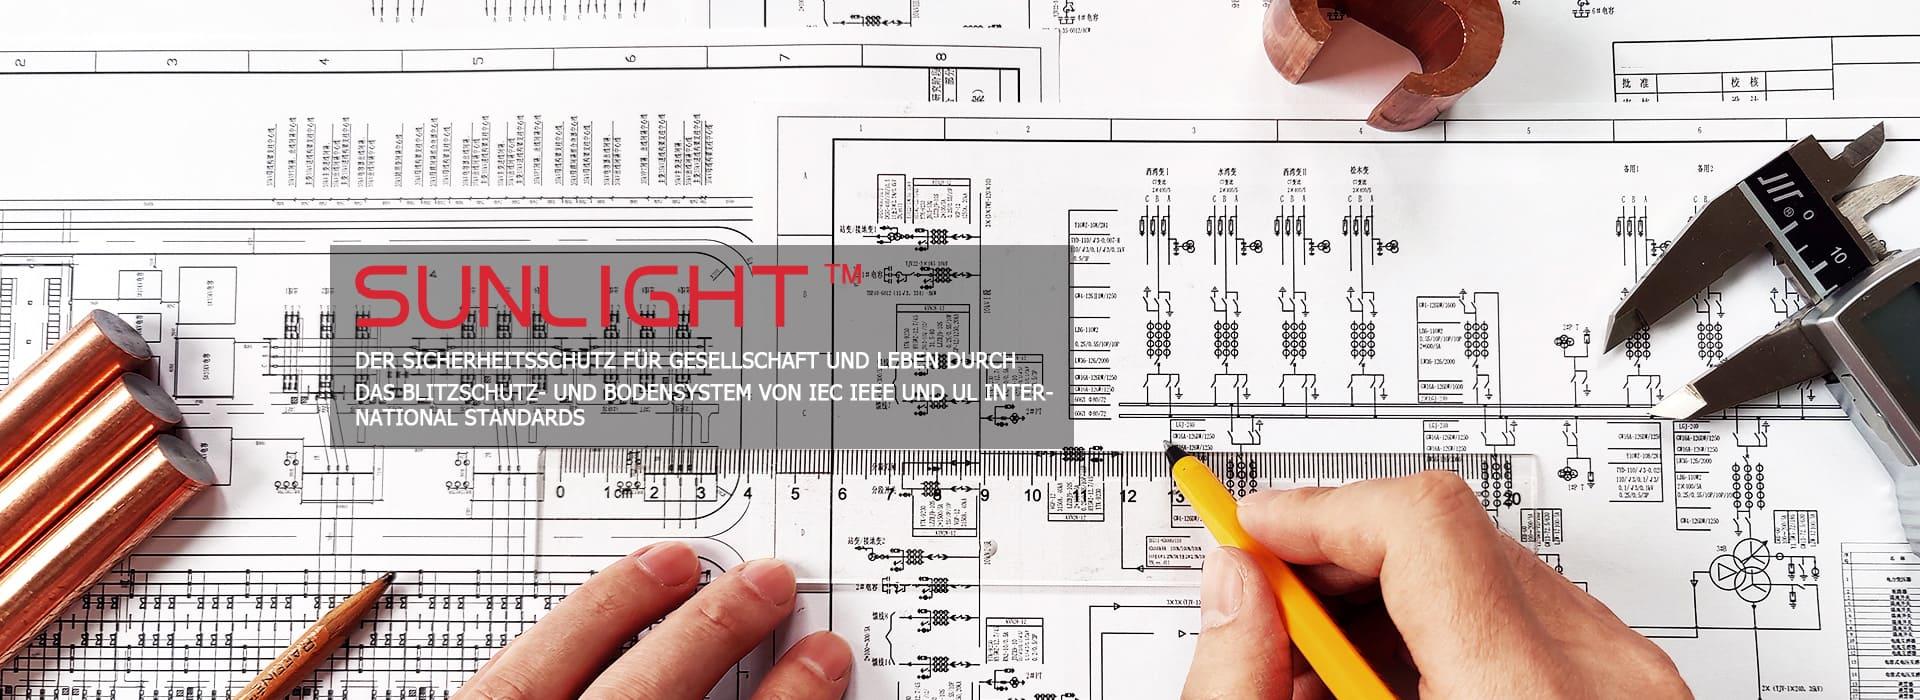 Sunlight™ Intelligent Electric Equipment Co., Ltd